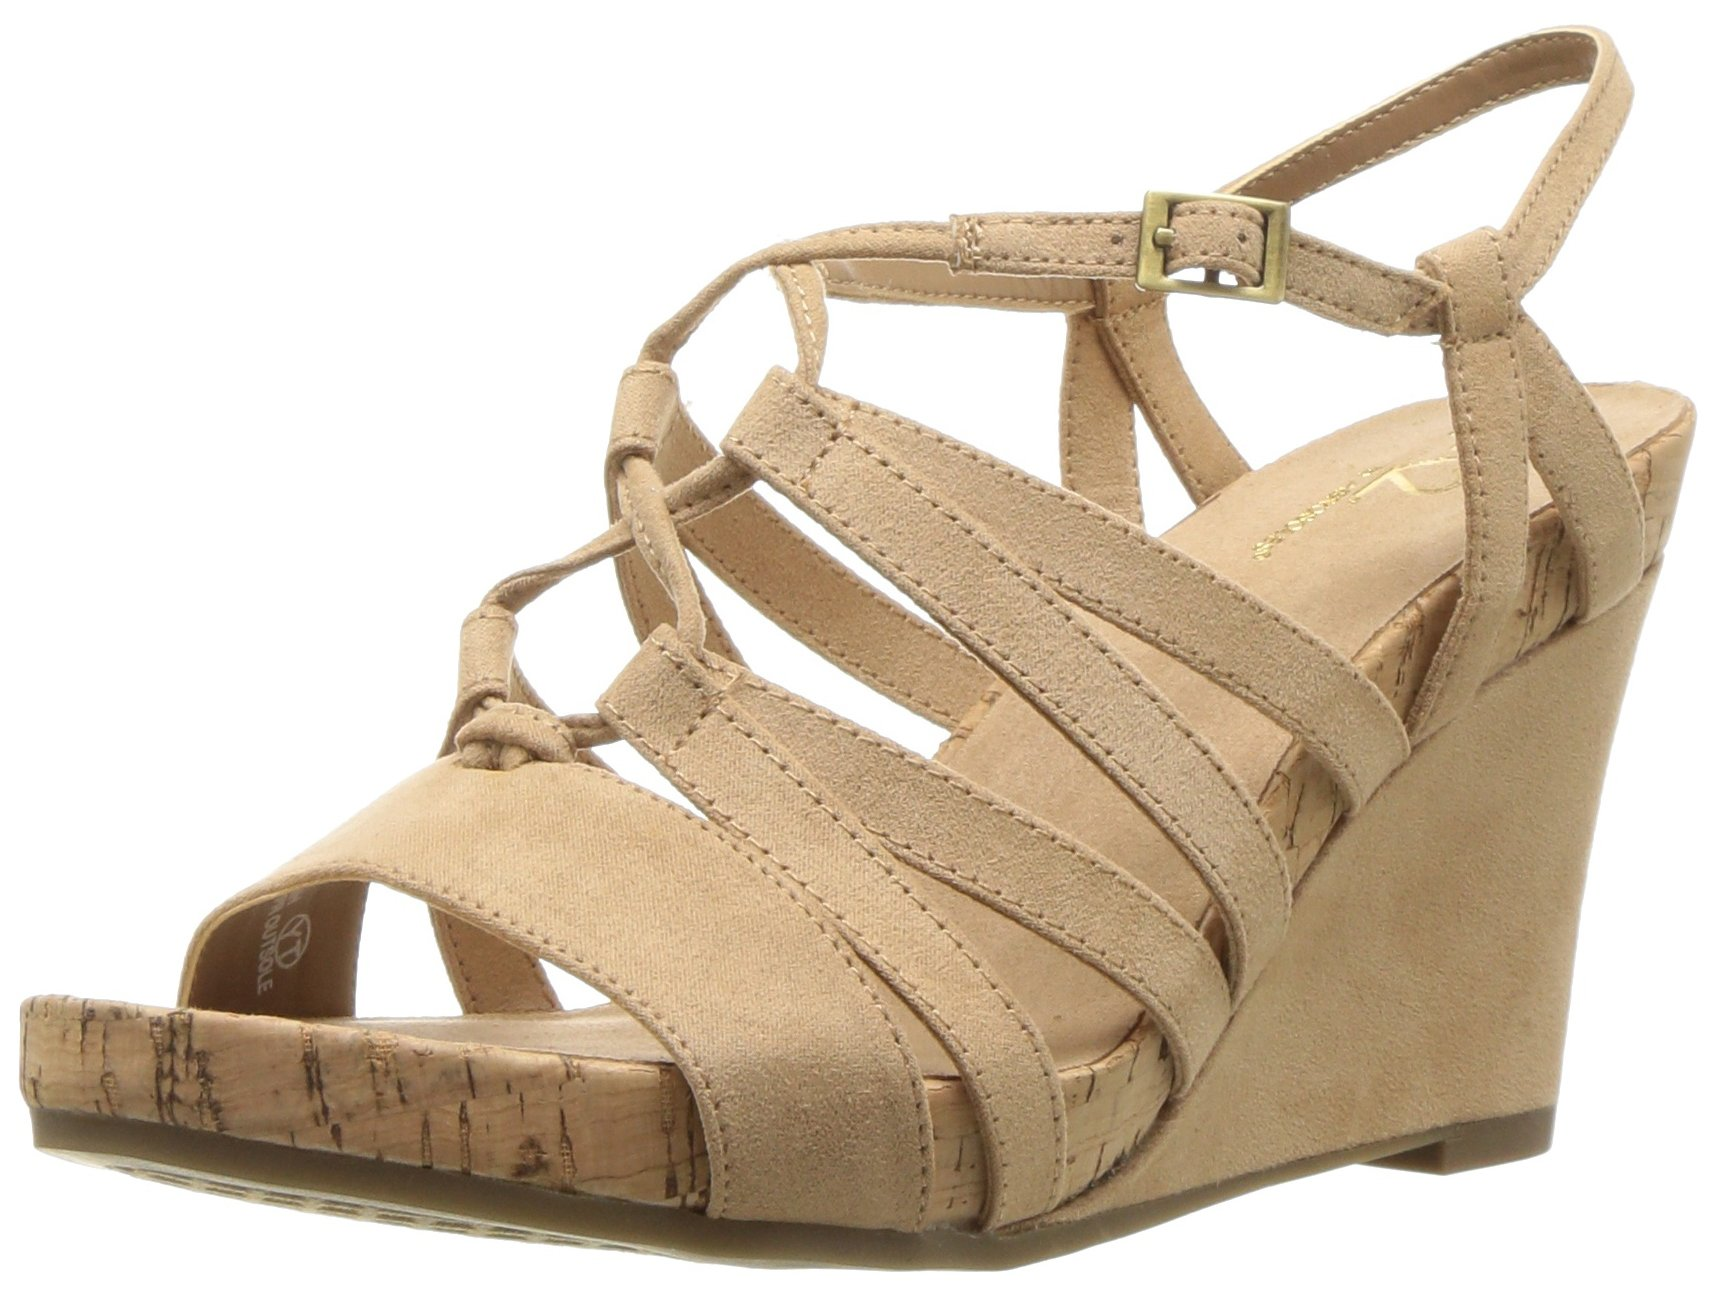 Aerosoles A2 Women's Poppy Plush Wedge Sandal, Light Tan, 8.5 M US